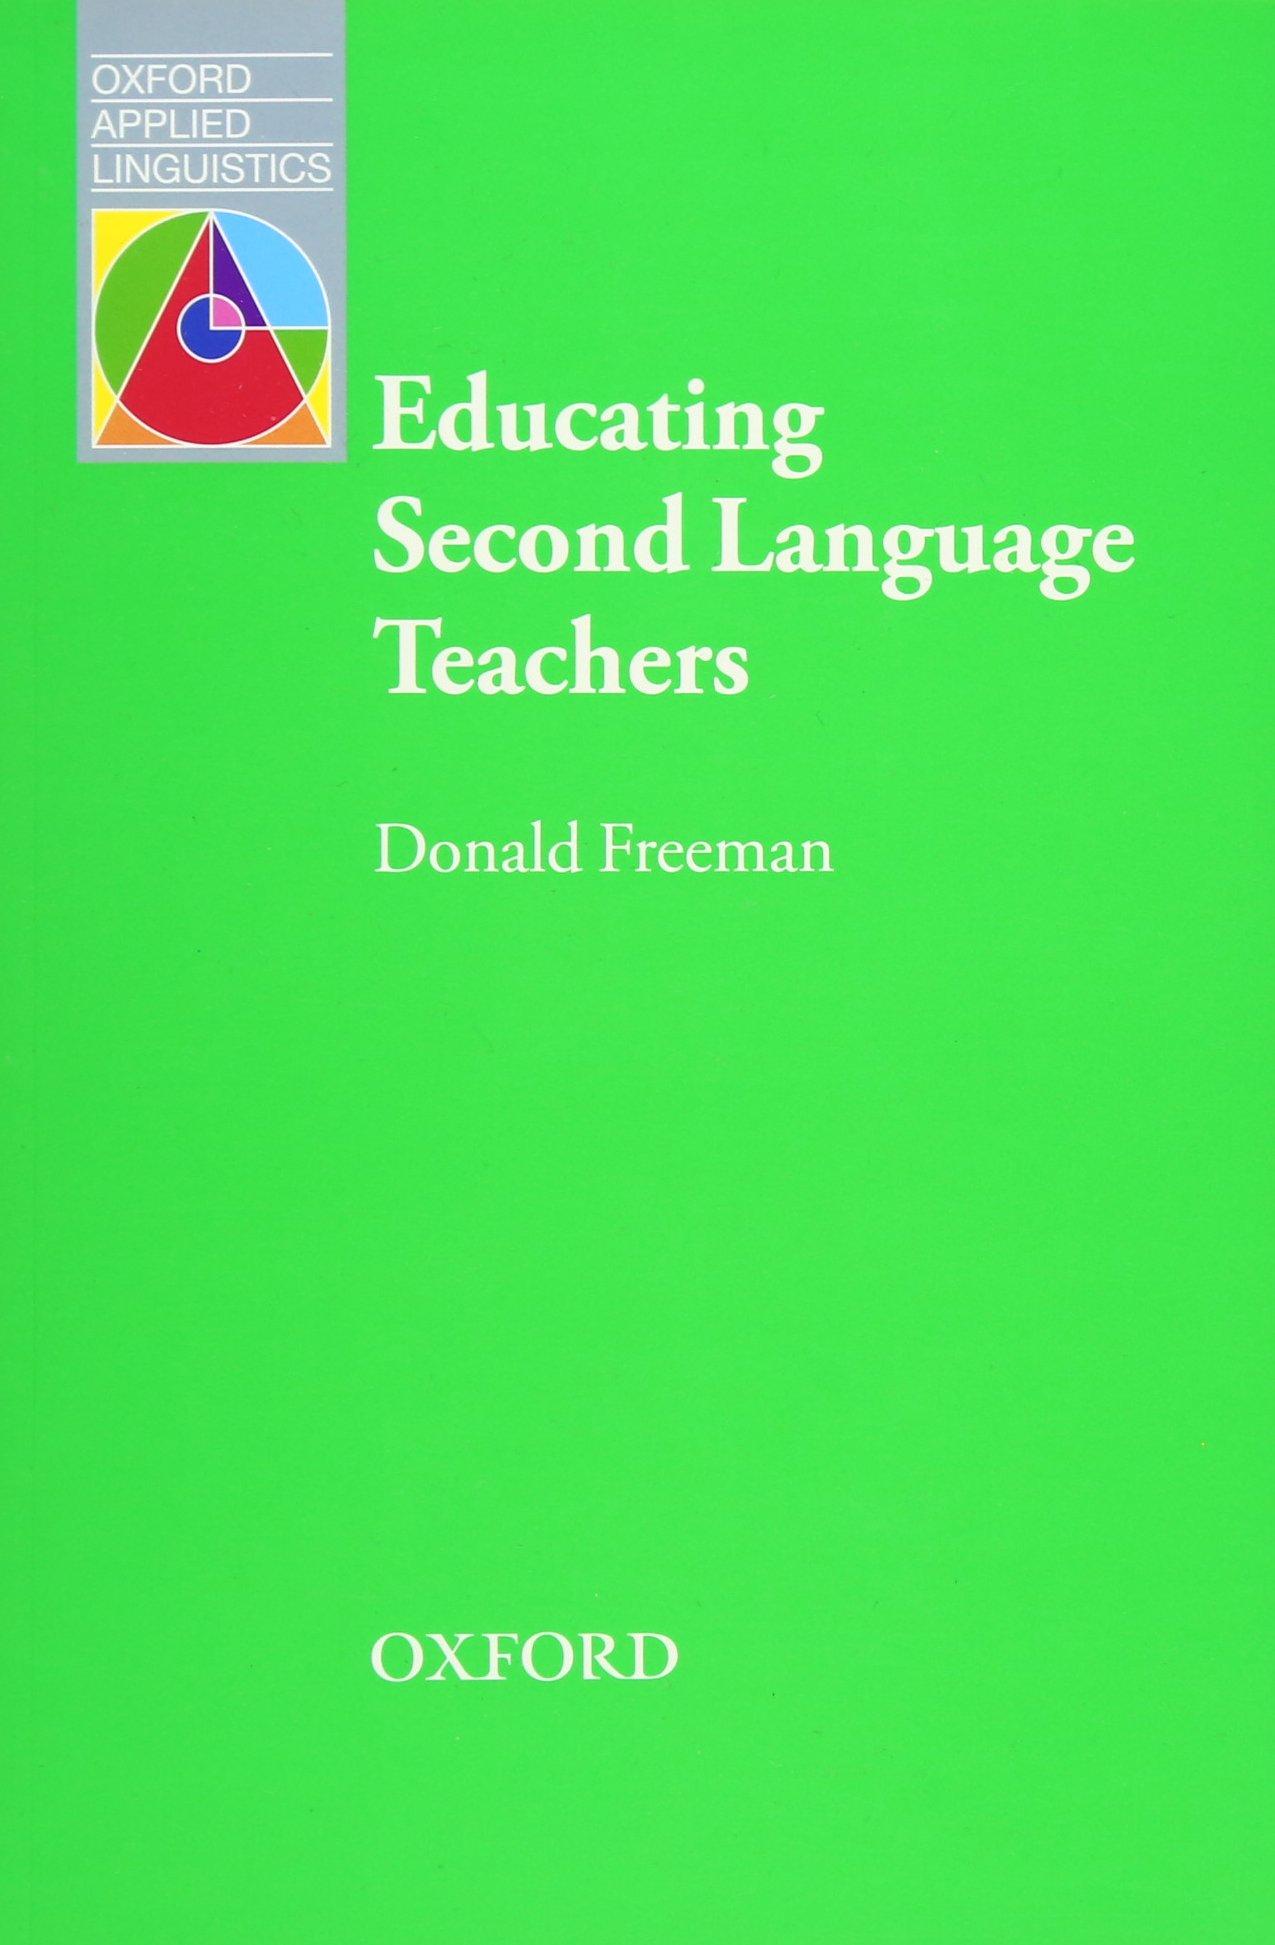 Educating Second Language Teachers (Oxford Applied Linguistics) (Inglés) Tapa blanda – 20 abr 2016 Donald Freeman S.A. 0194427560 English As A Second Language